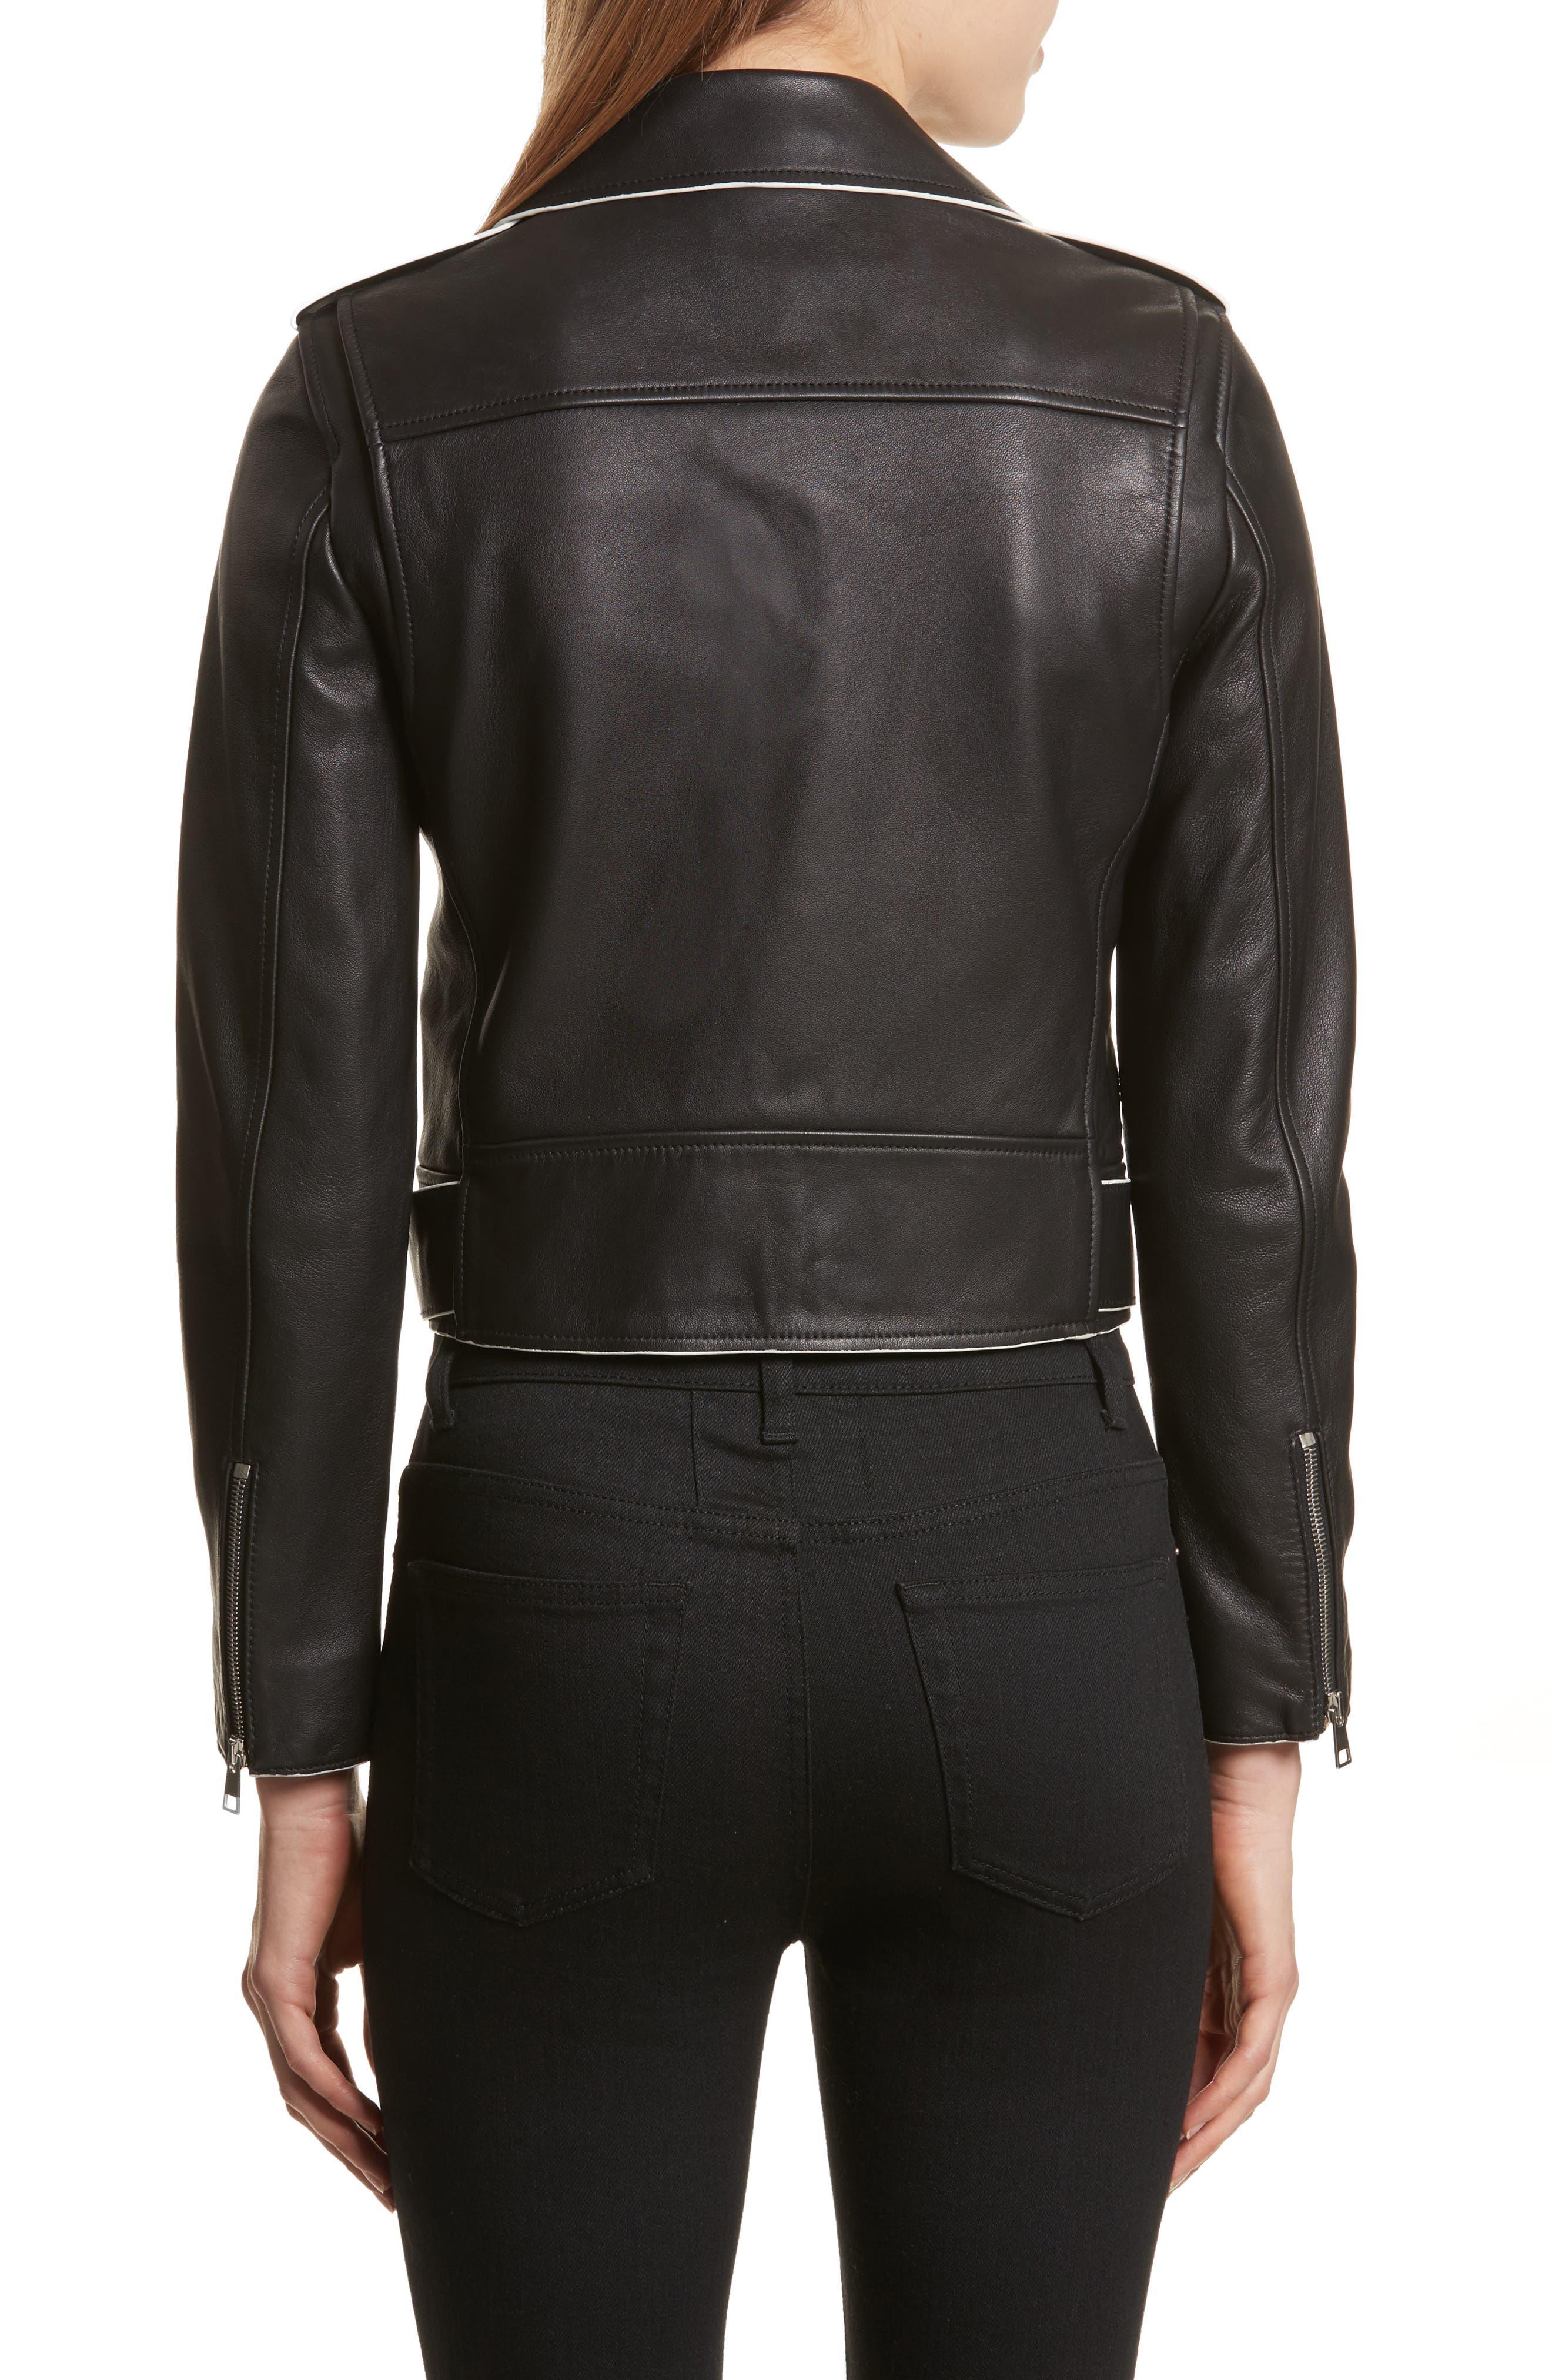 Painted Edge Shrunken Leather Moto Jacket,                             Alternate thumbnail 2, color,                             001